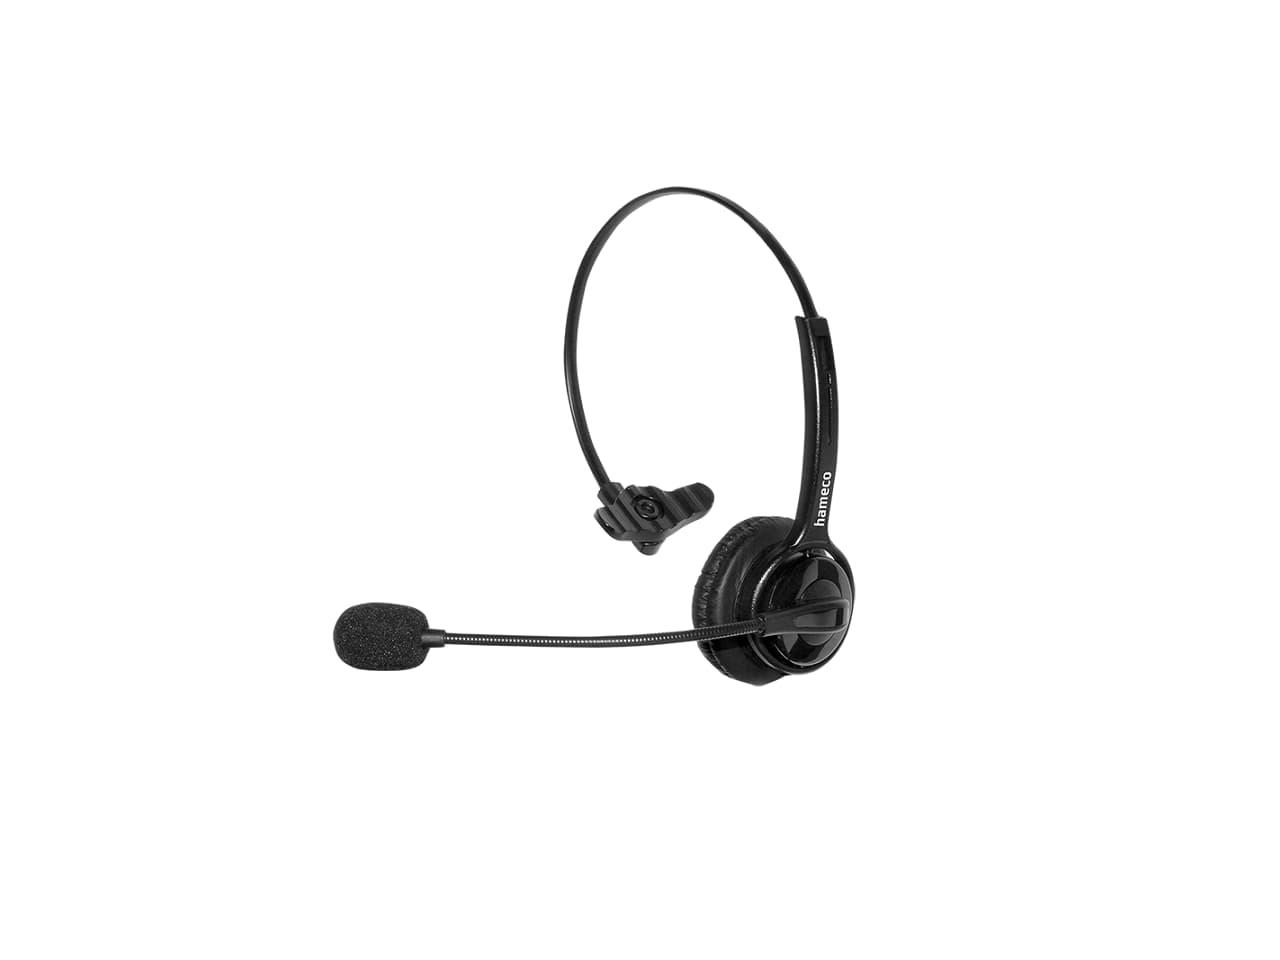 Hameco call center headset, fejhallgató, vezetékes fejhallgató mikrofonnal. call center headset ecosonic HS-1077M-QD